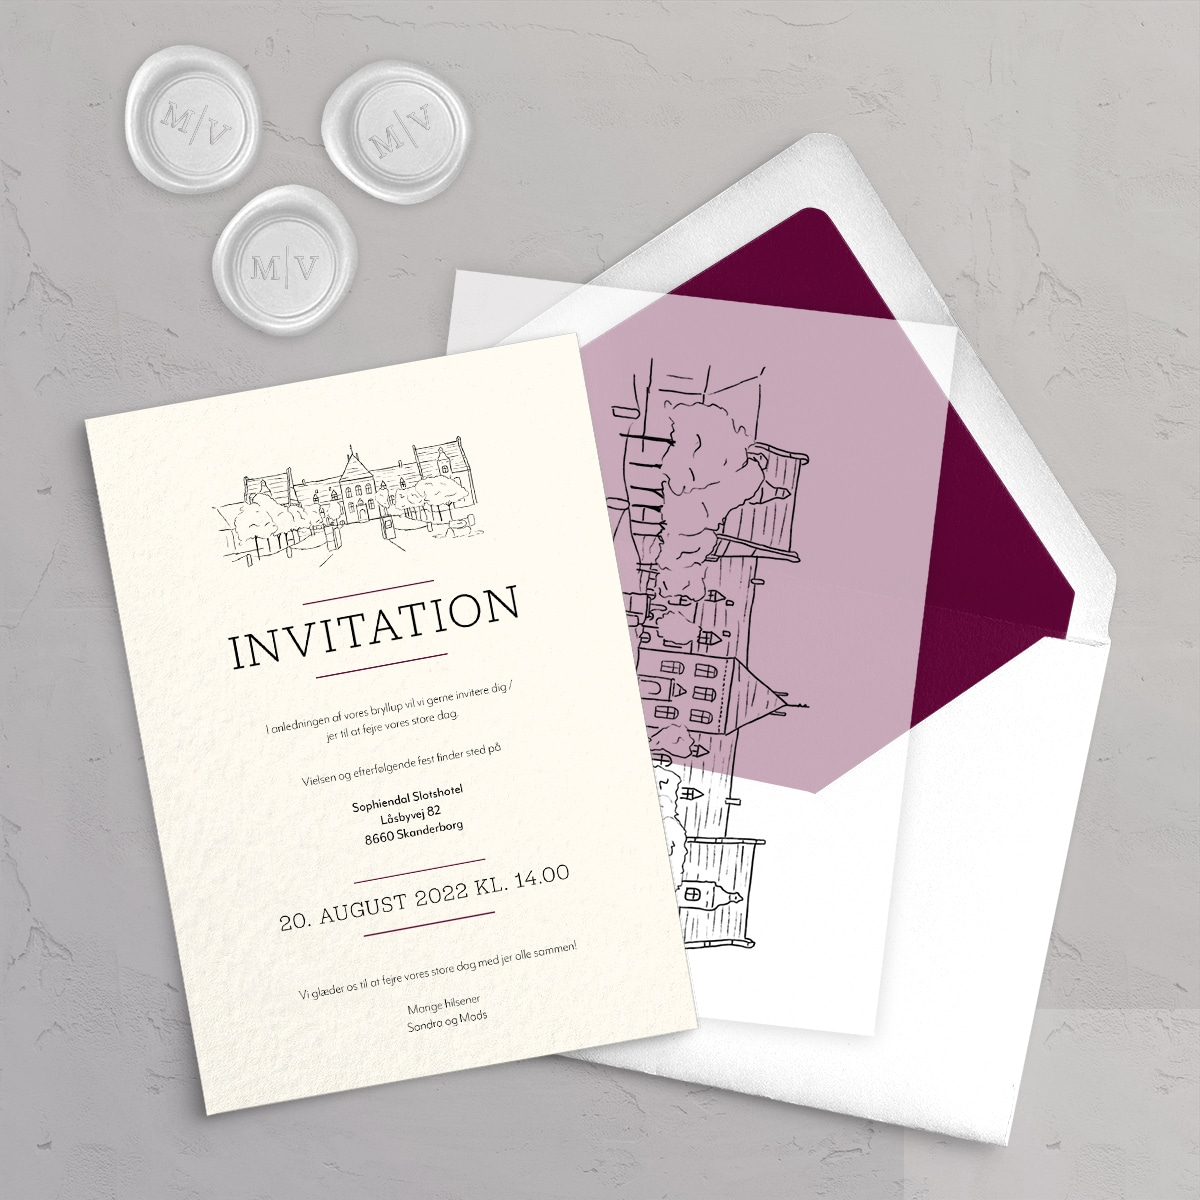 Bryllupsinvitation Sophiendal Slotshotel på akvarelpapir med vellumcover, monogram klistermærke og foret kuvert i farven Winter Berry